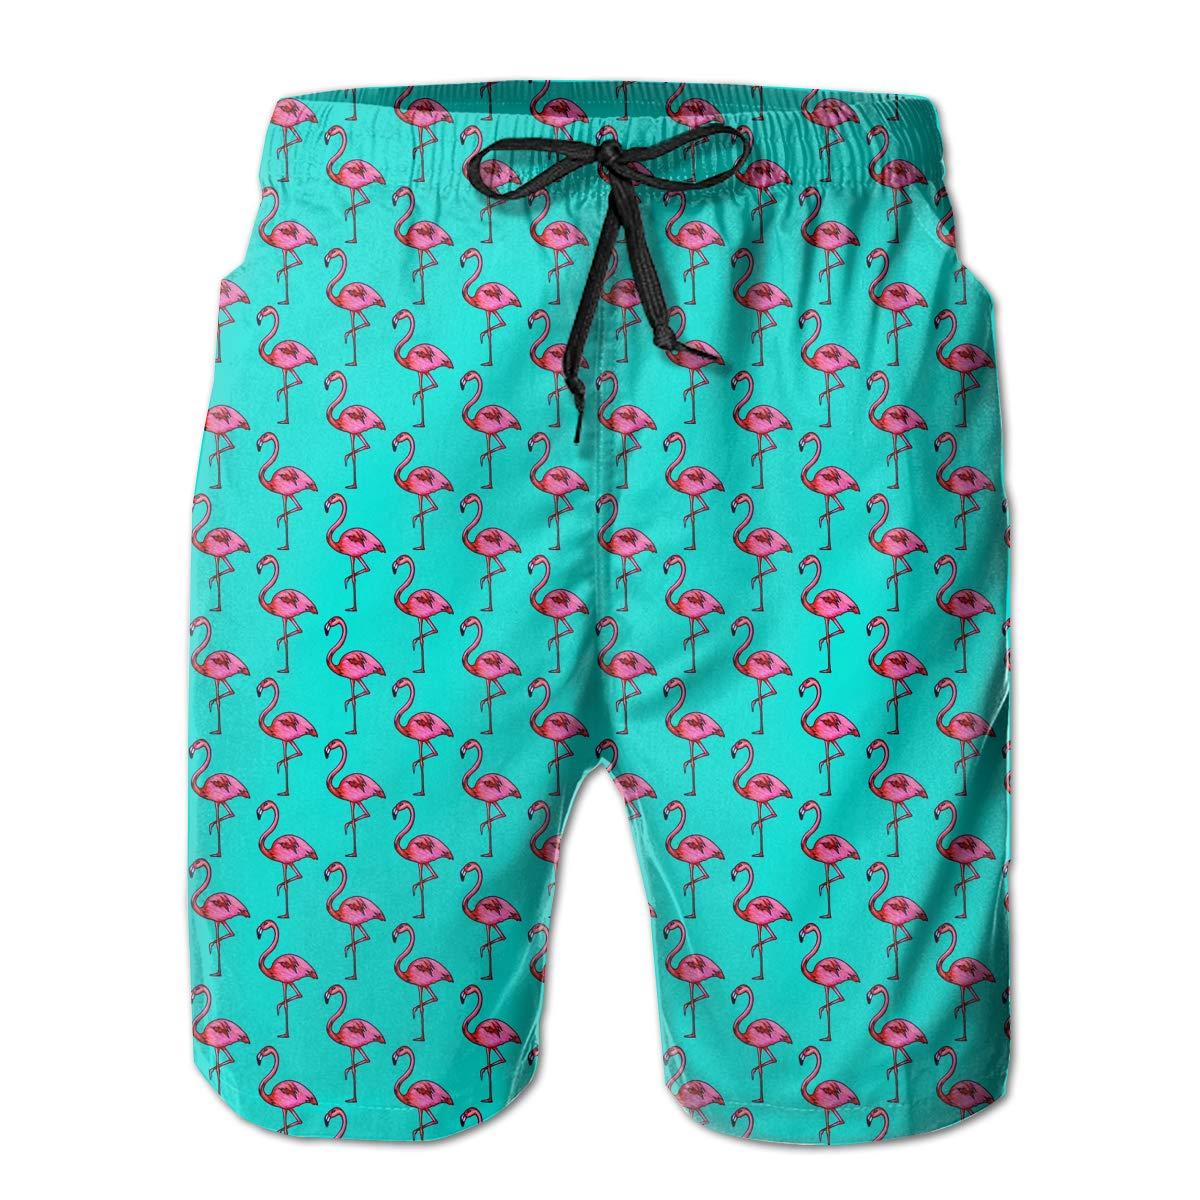 Mens Funny Flamingo Comfortable Quick Dry Swim Trunks Elastic Drawstring Cargo Shorts with Pocket